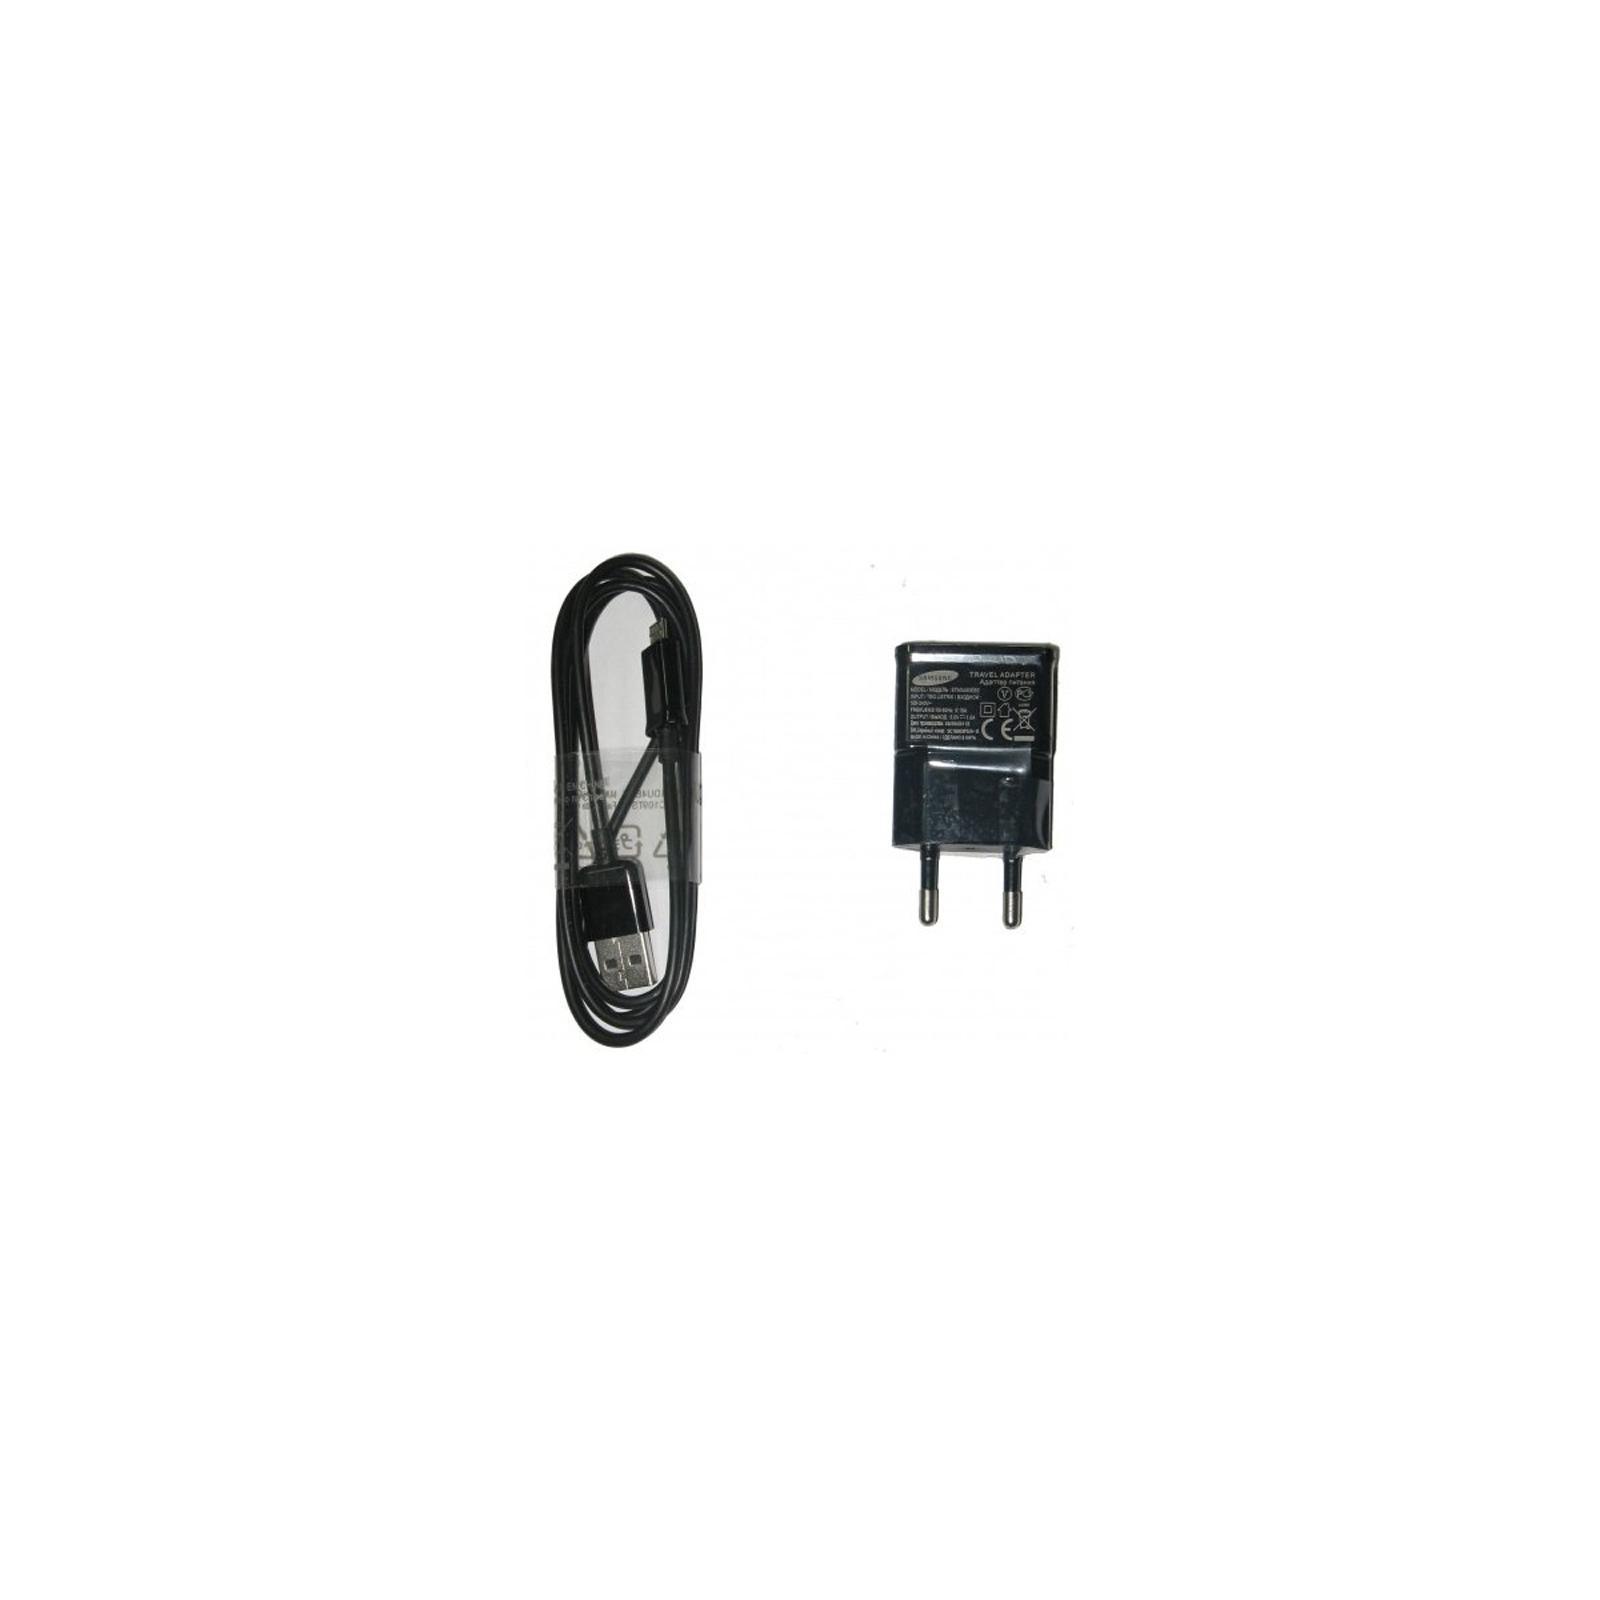 Зарядное устройство Samsung ETAOU80EBE (21349 / ETAOU80)